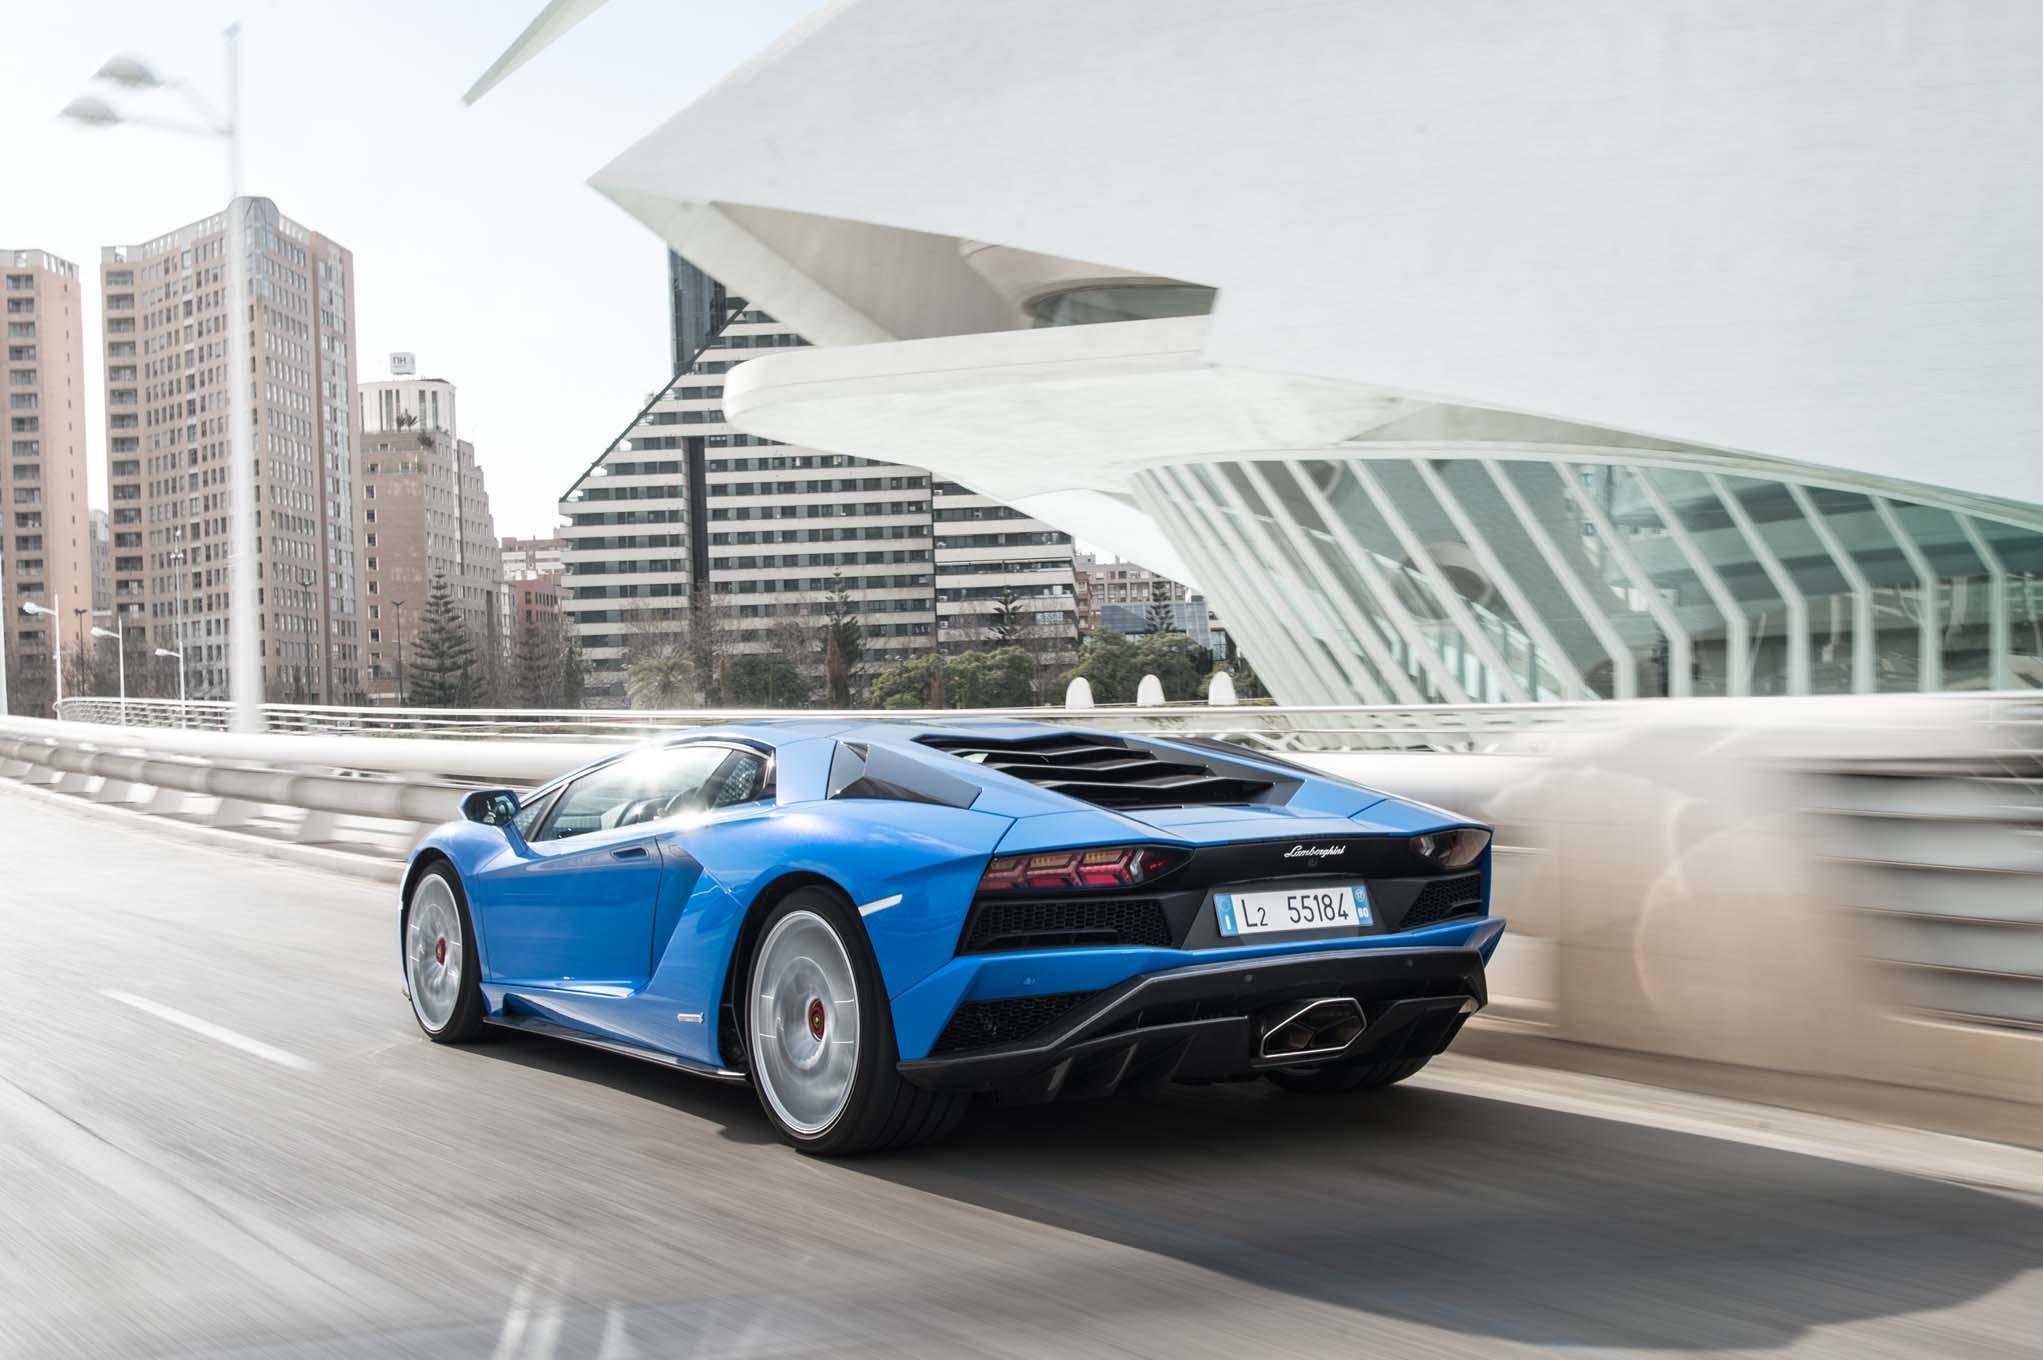 2018 Lamborghini Aventador S Rear Three Quarter In Motion 09